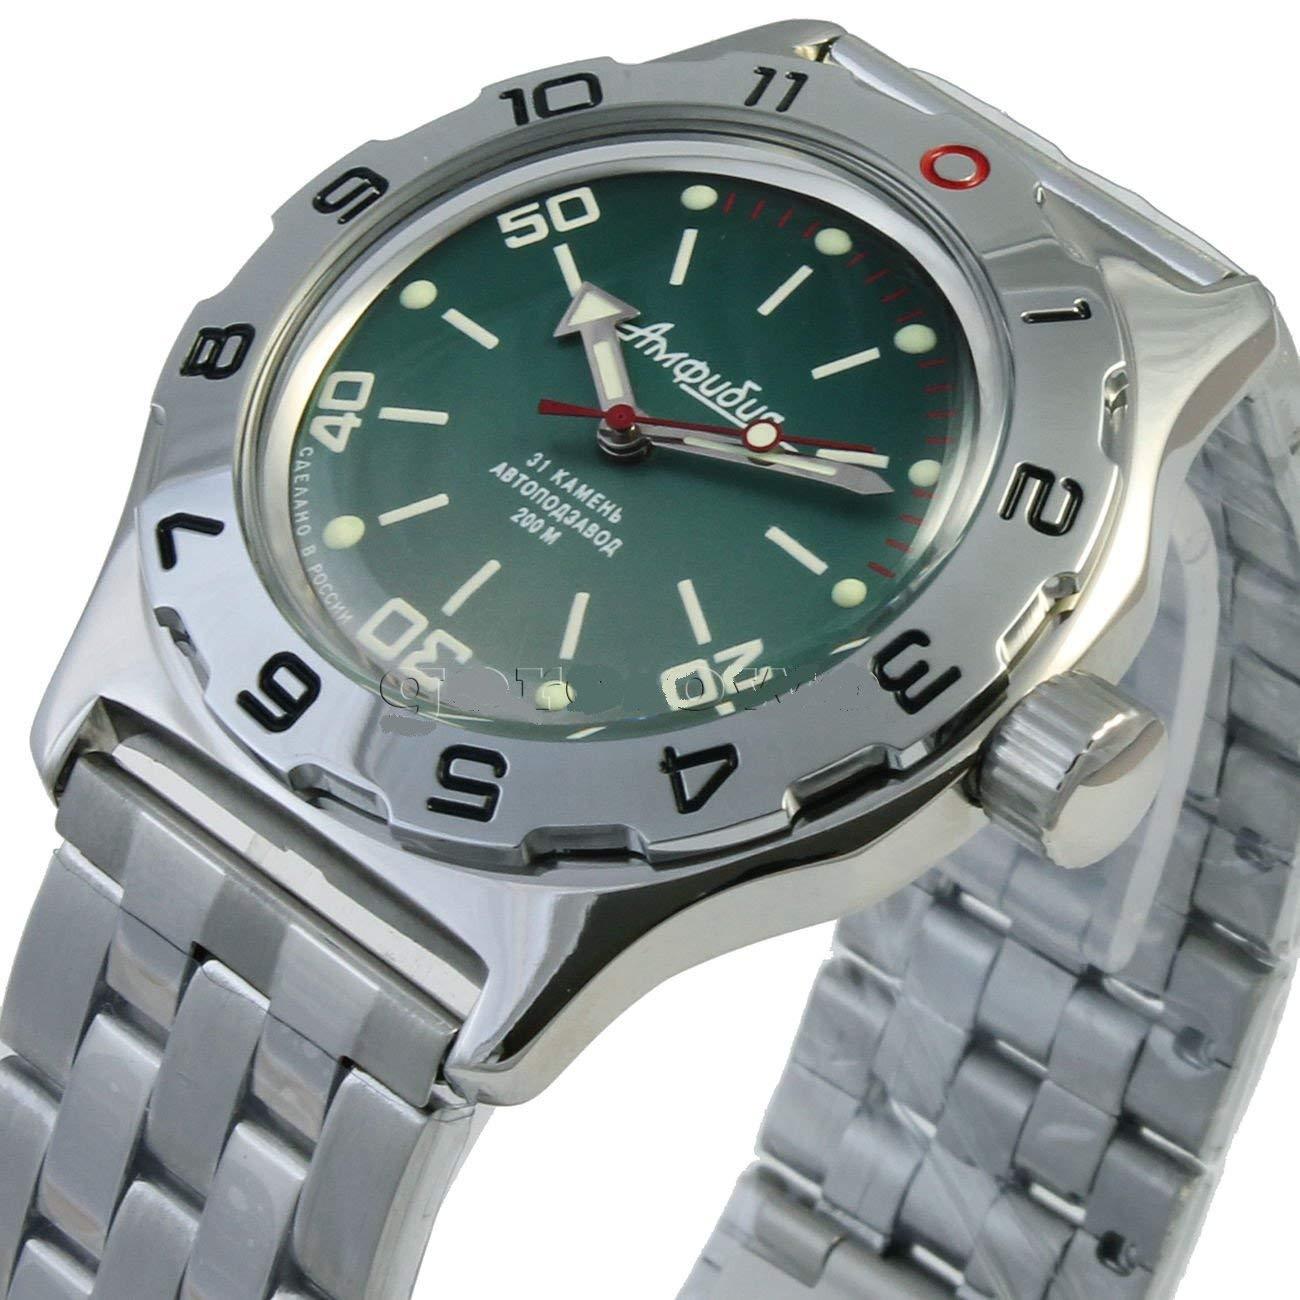 Amazon.com: Vostok New Amphibian 100821 Russian Automatic Divers Wrist Watch 200m Auto Green: Vostok: Watches